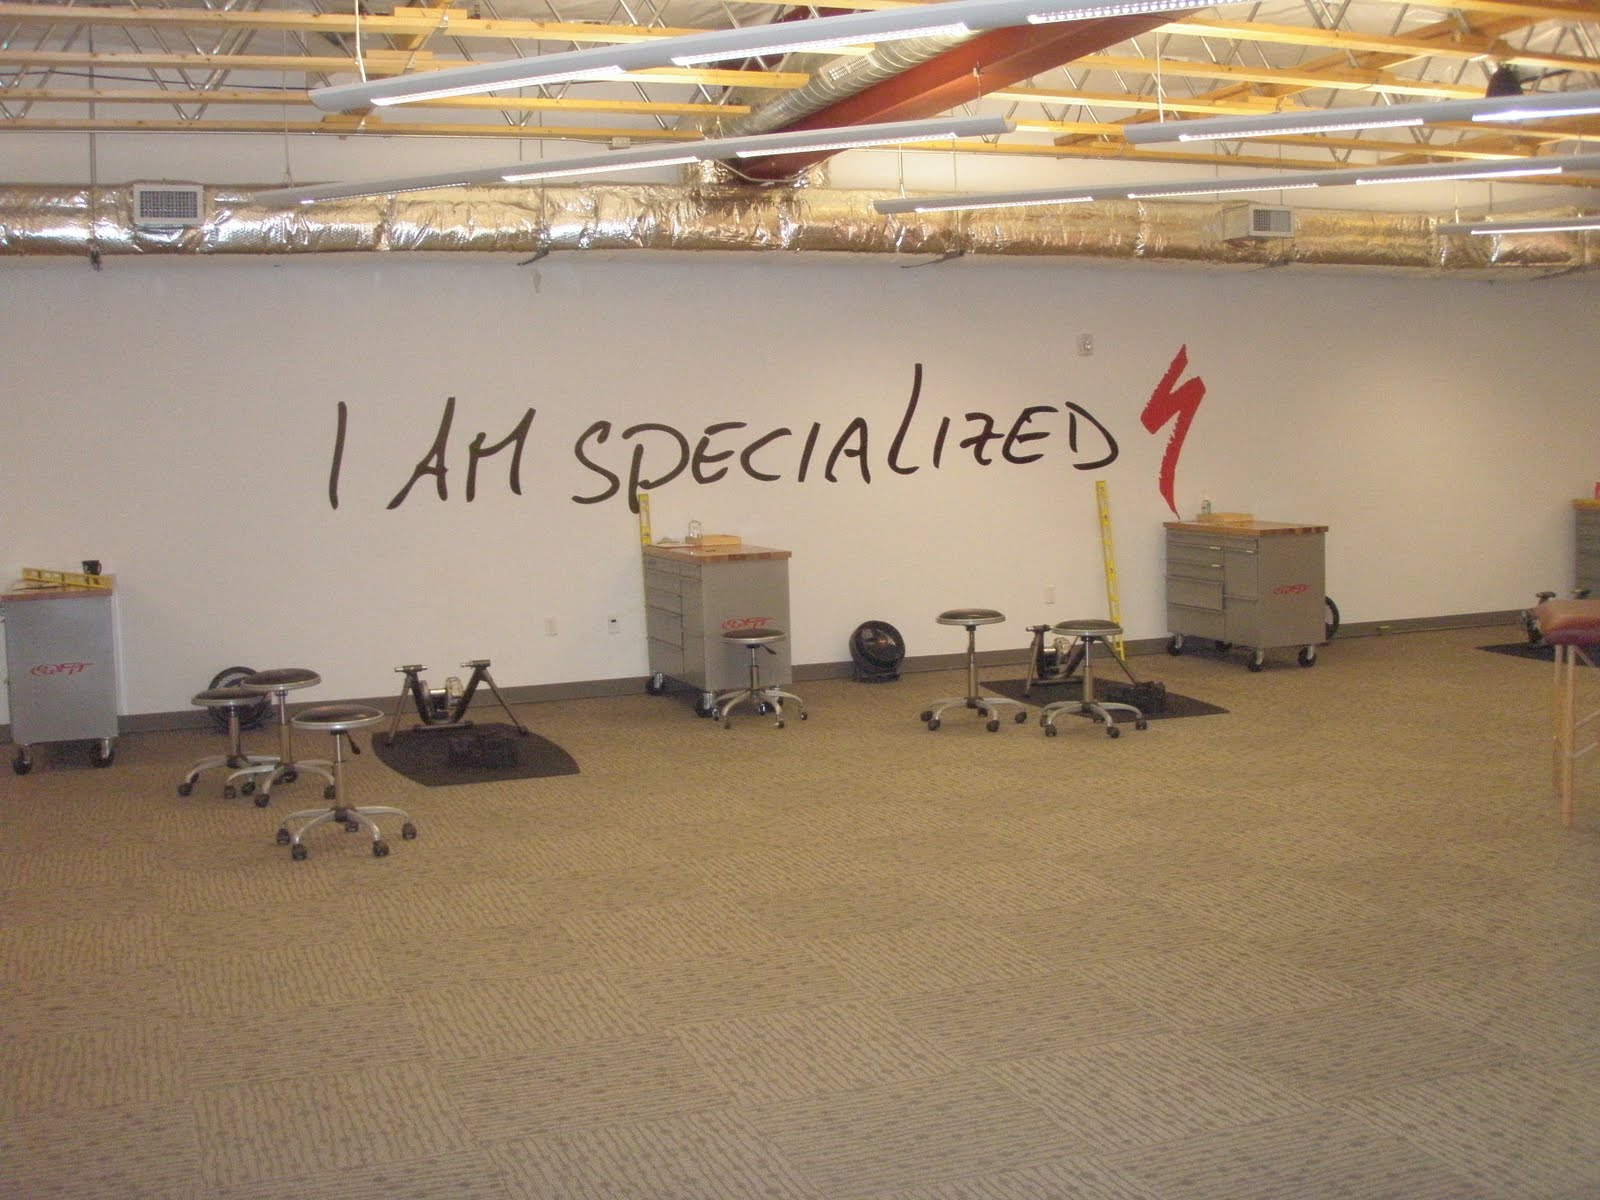 I Am Specialized Wallpaper   www.pixshark.com - Images ...